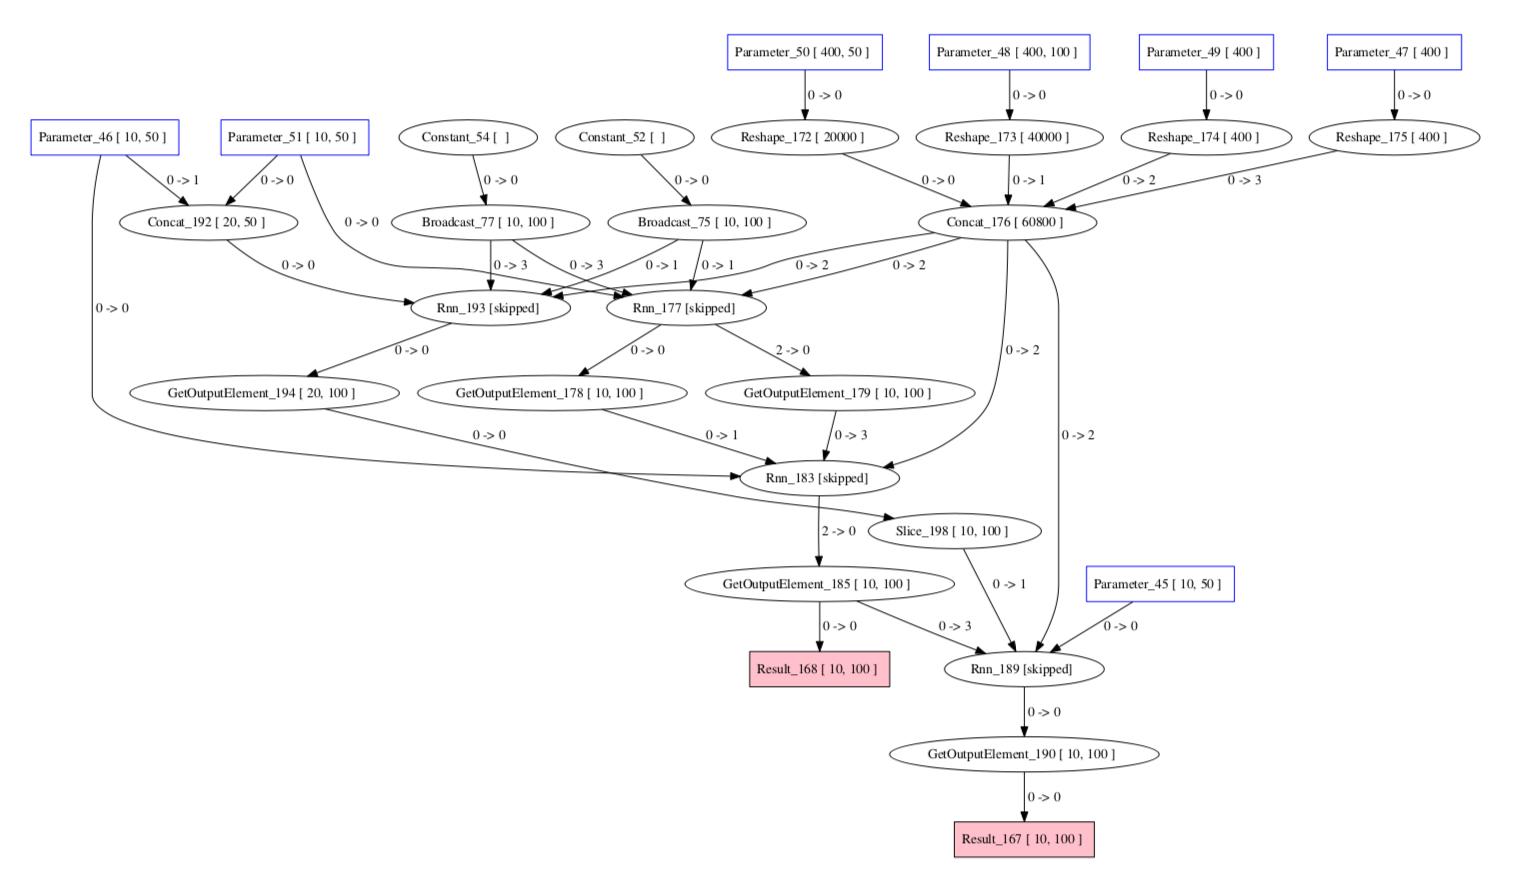 NervanaSystems - Bountysource